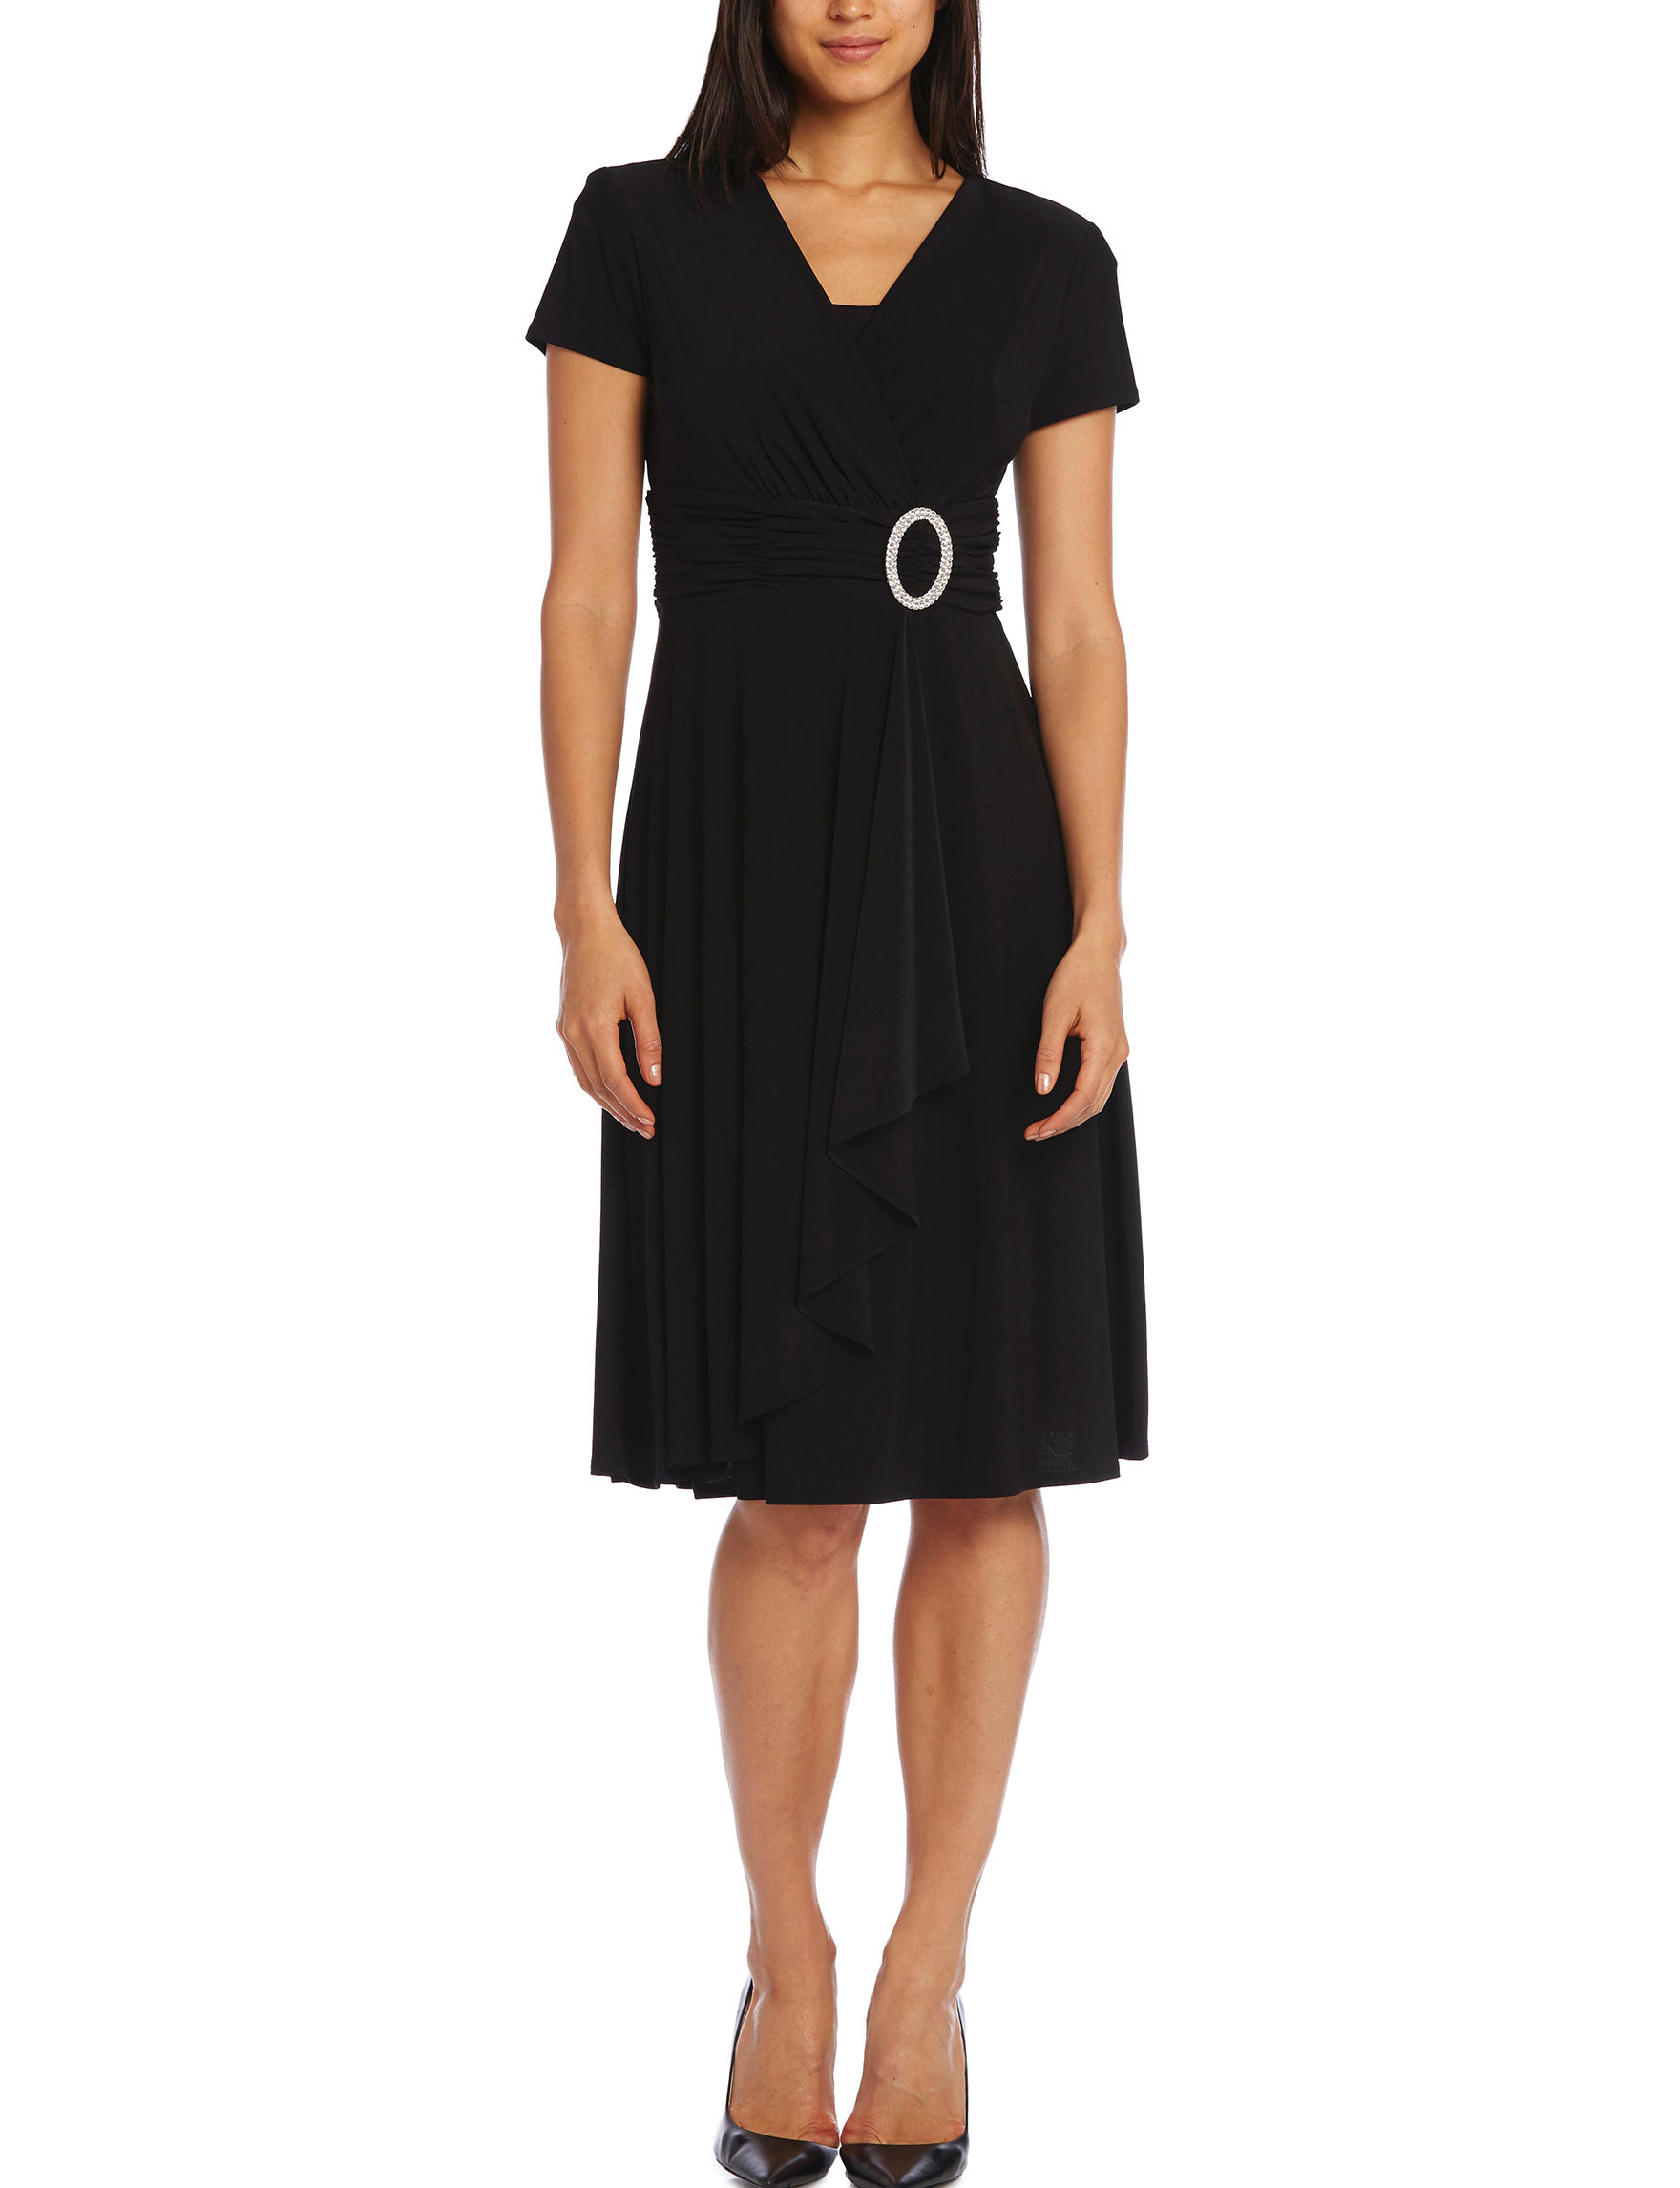 R & M Richards Black Cocktail & Party Evening & Formal A-line Dresses Fit & Flare Dresses